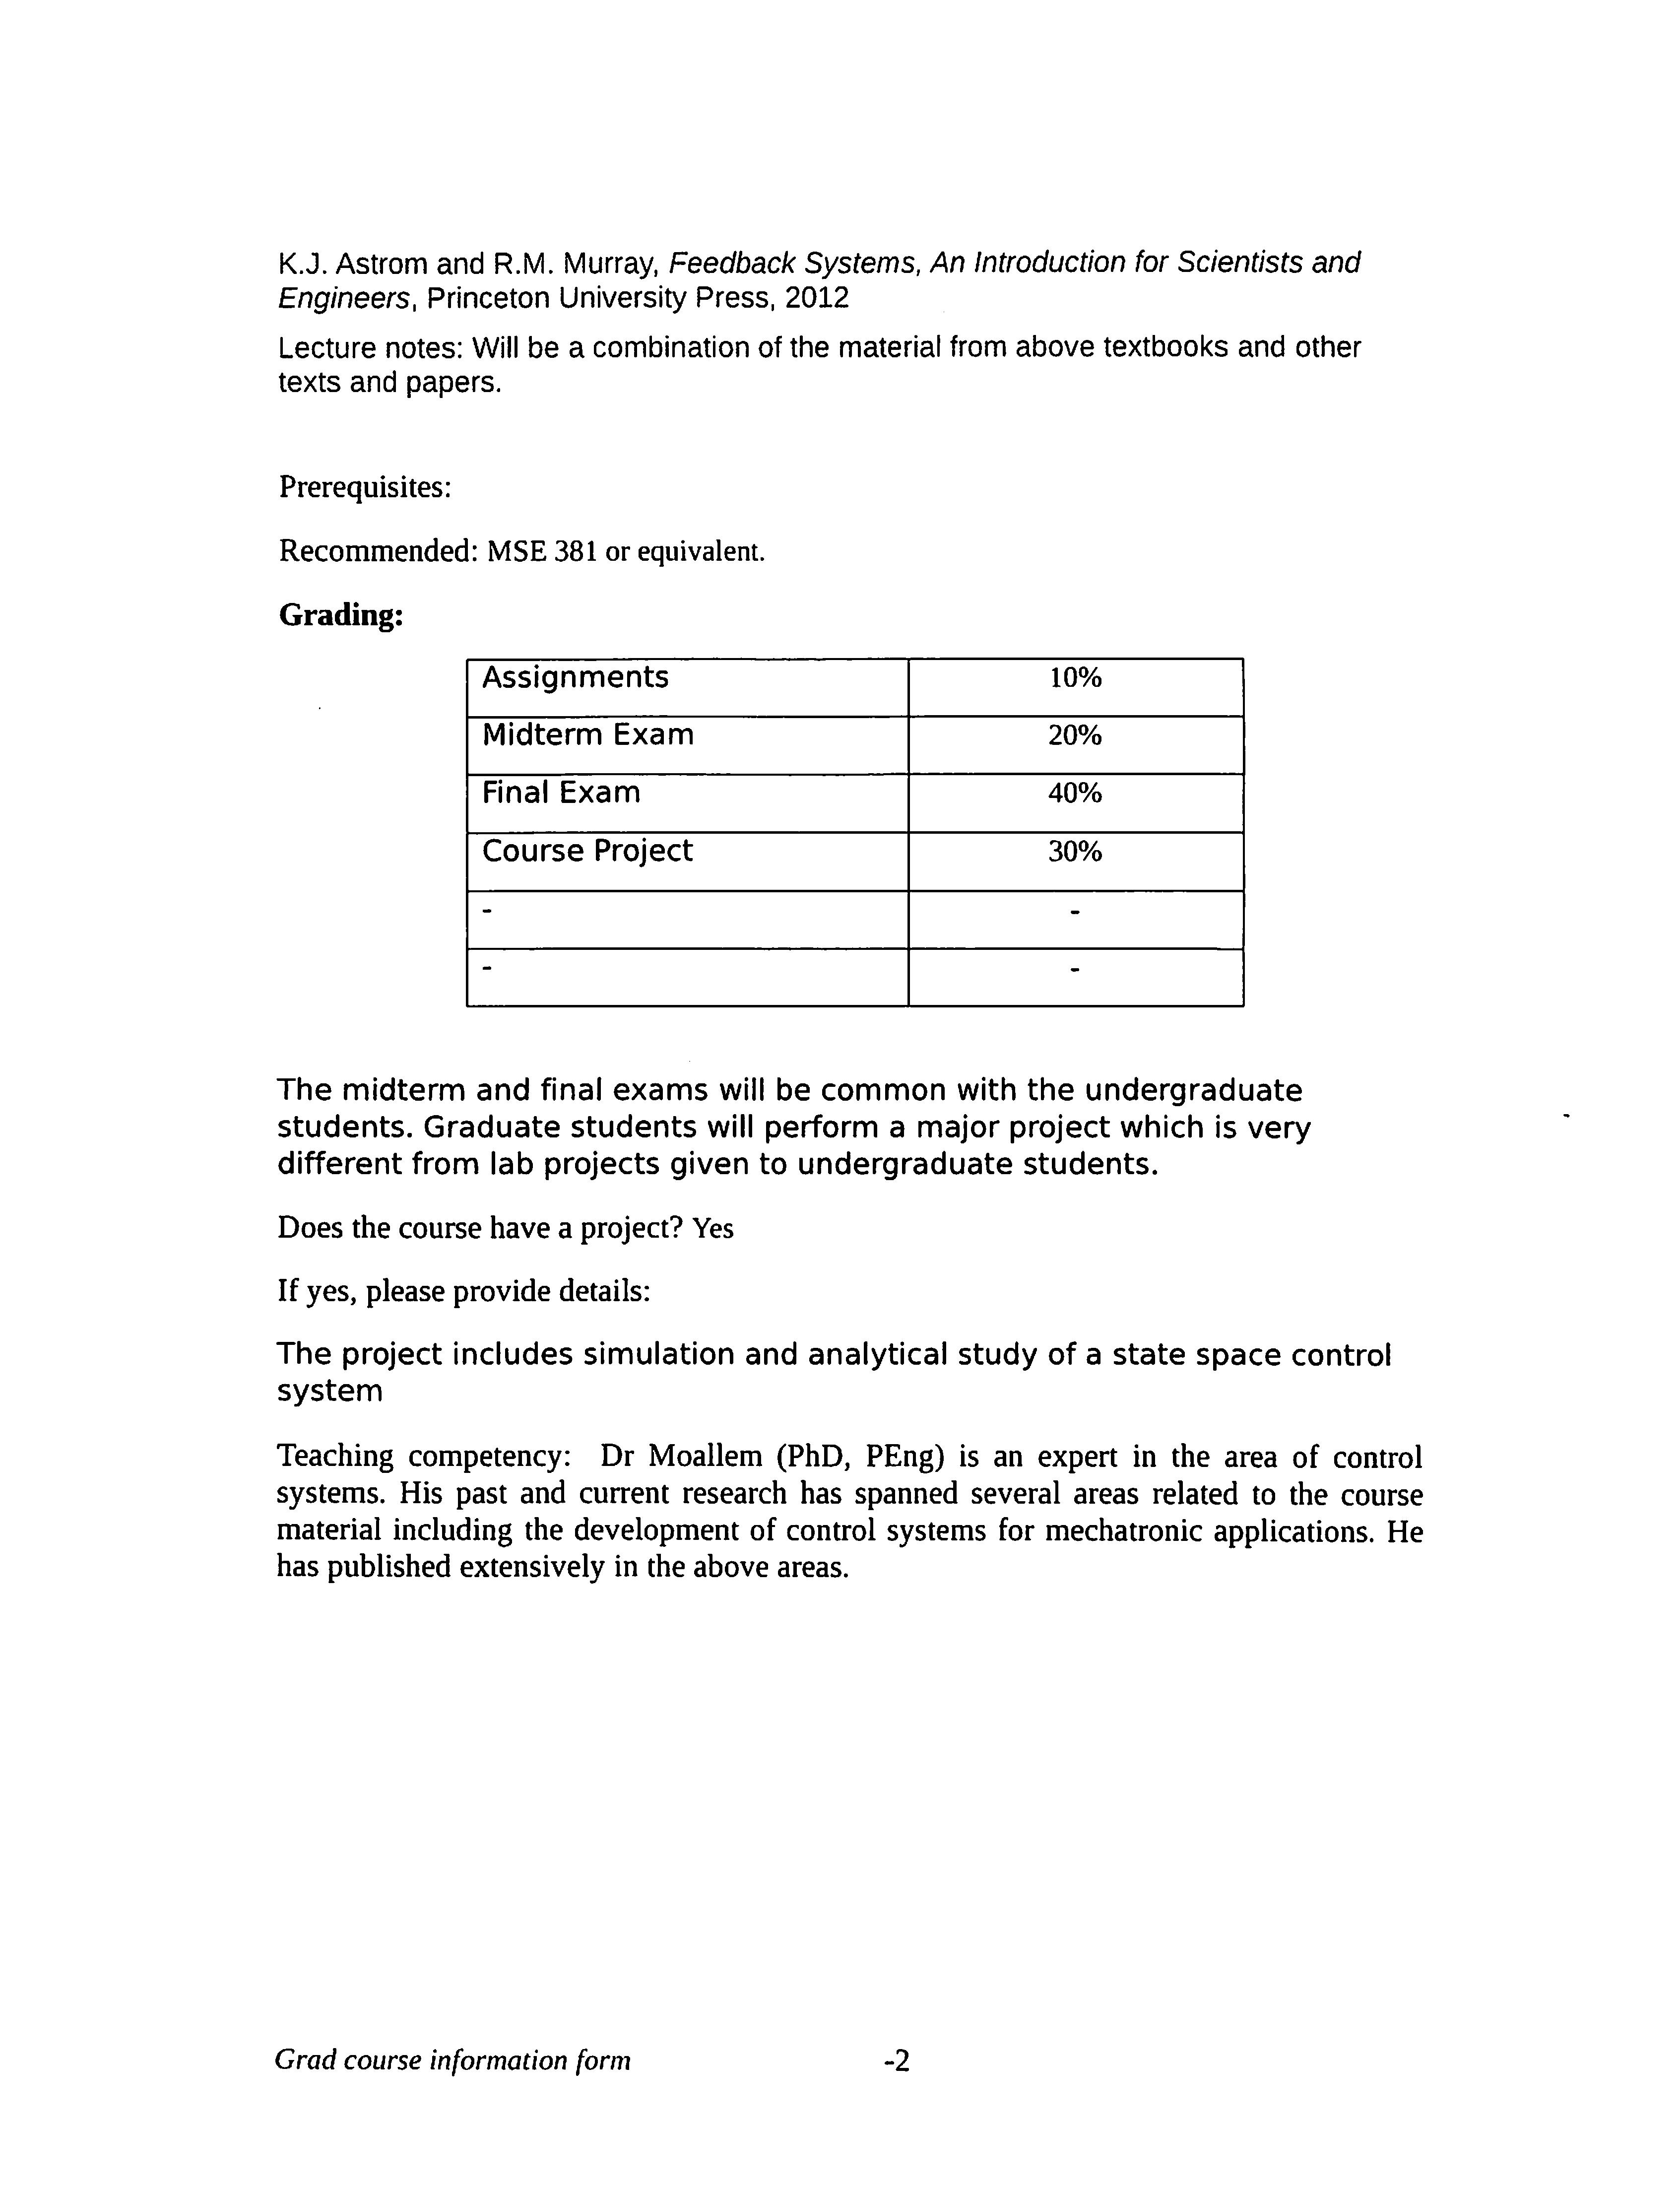 signet qv 3063 user manual